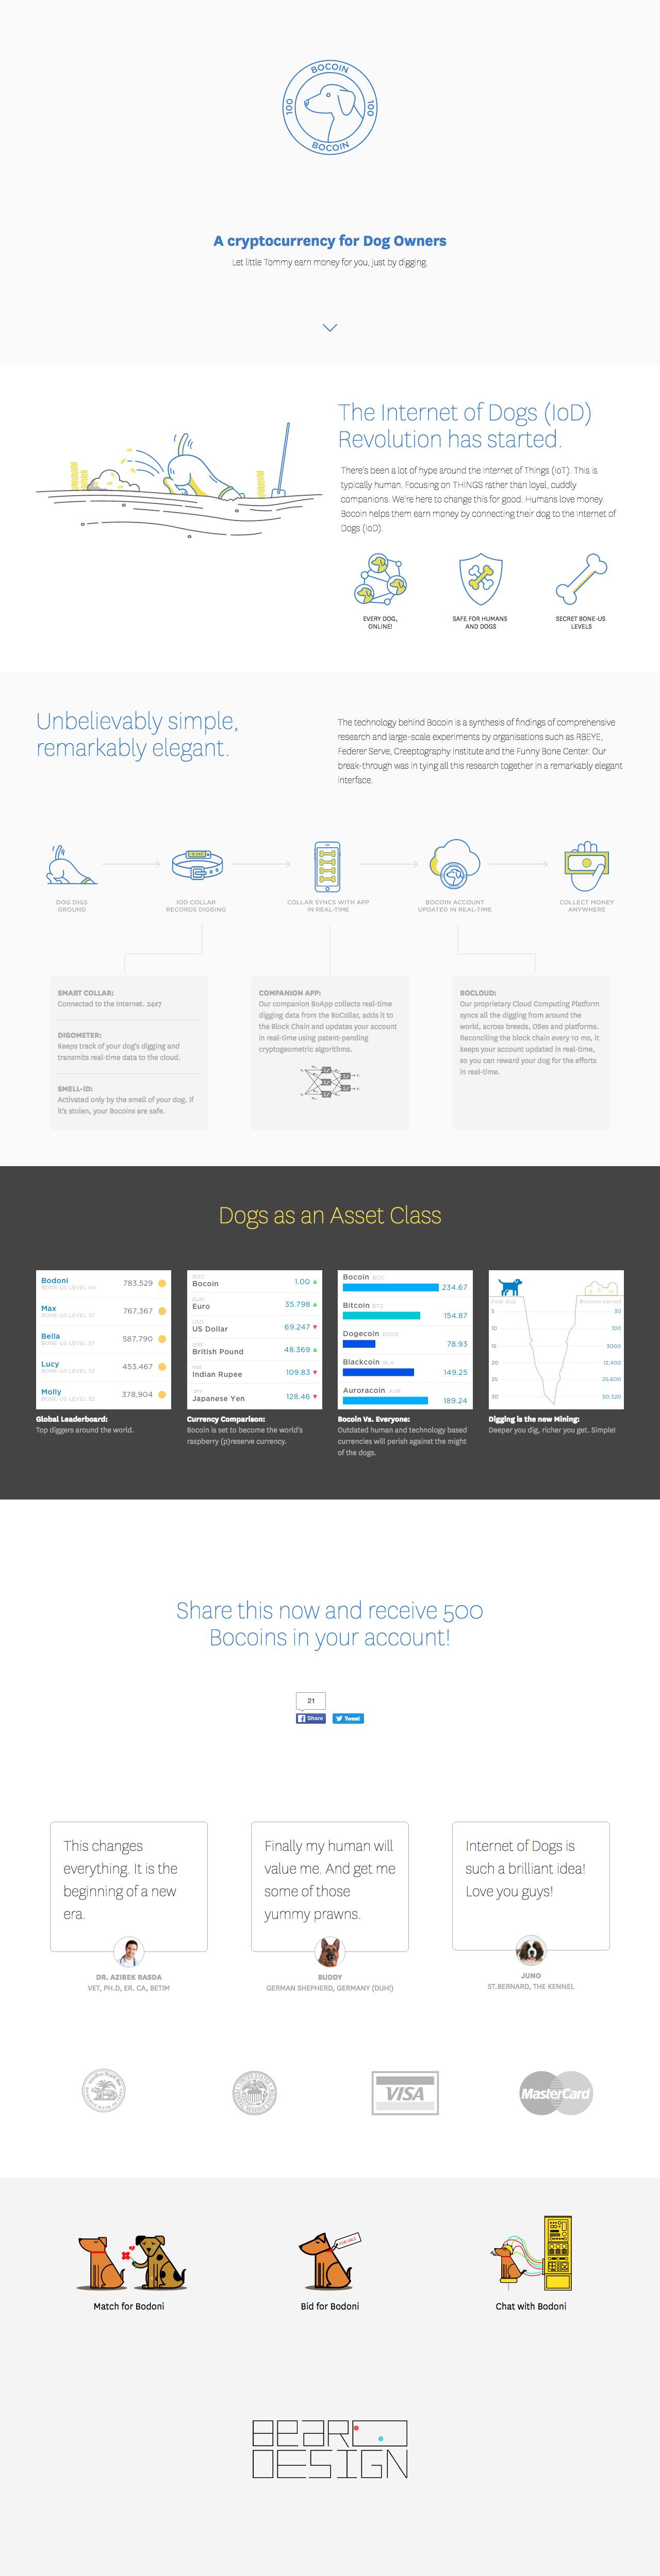 Bocoin Website Screenshot